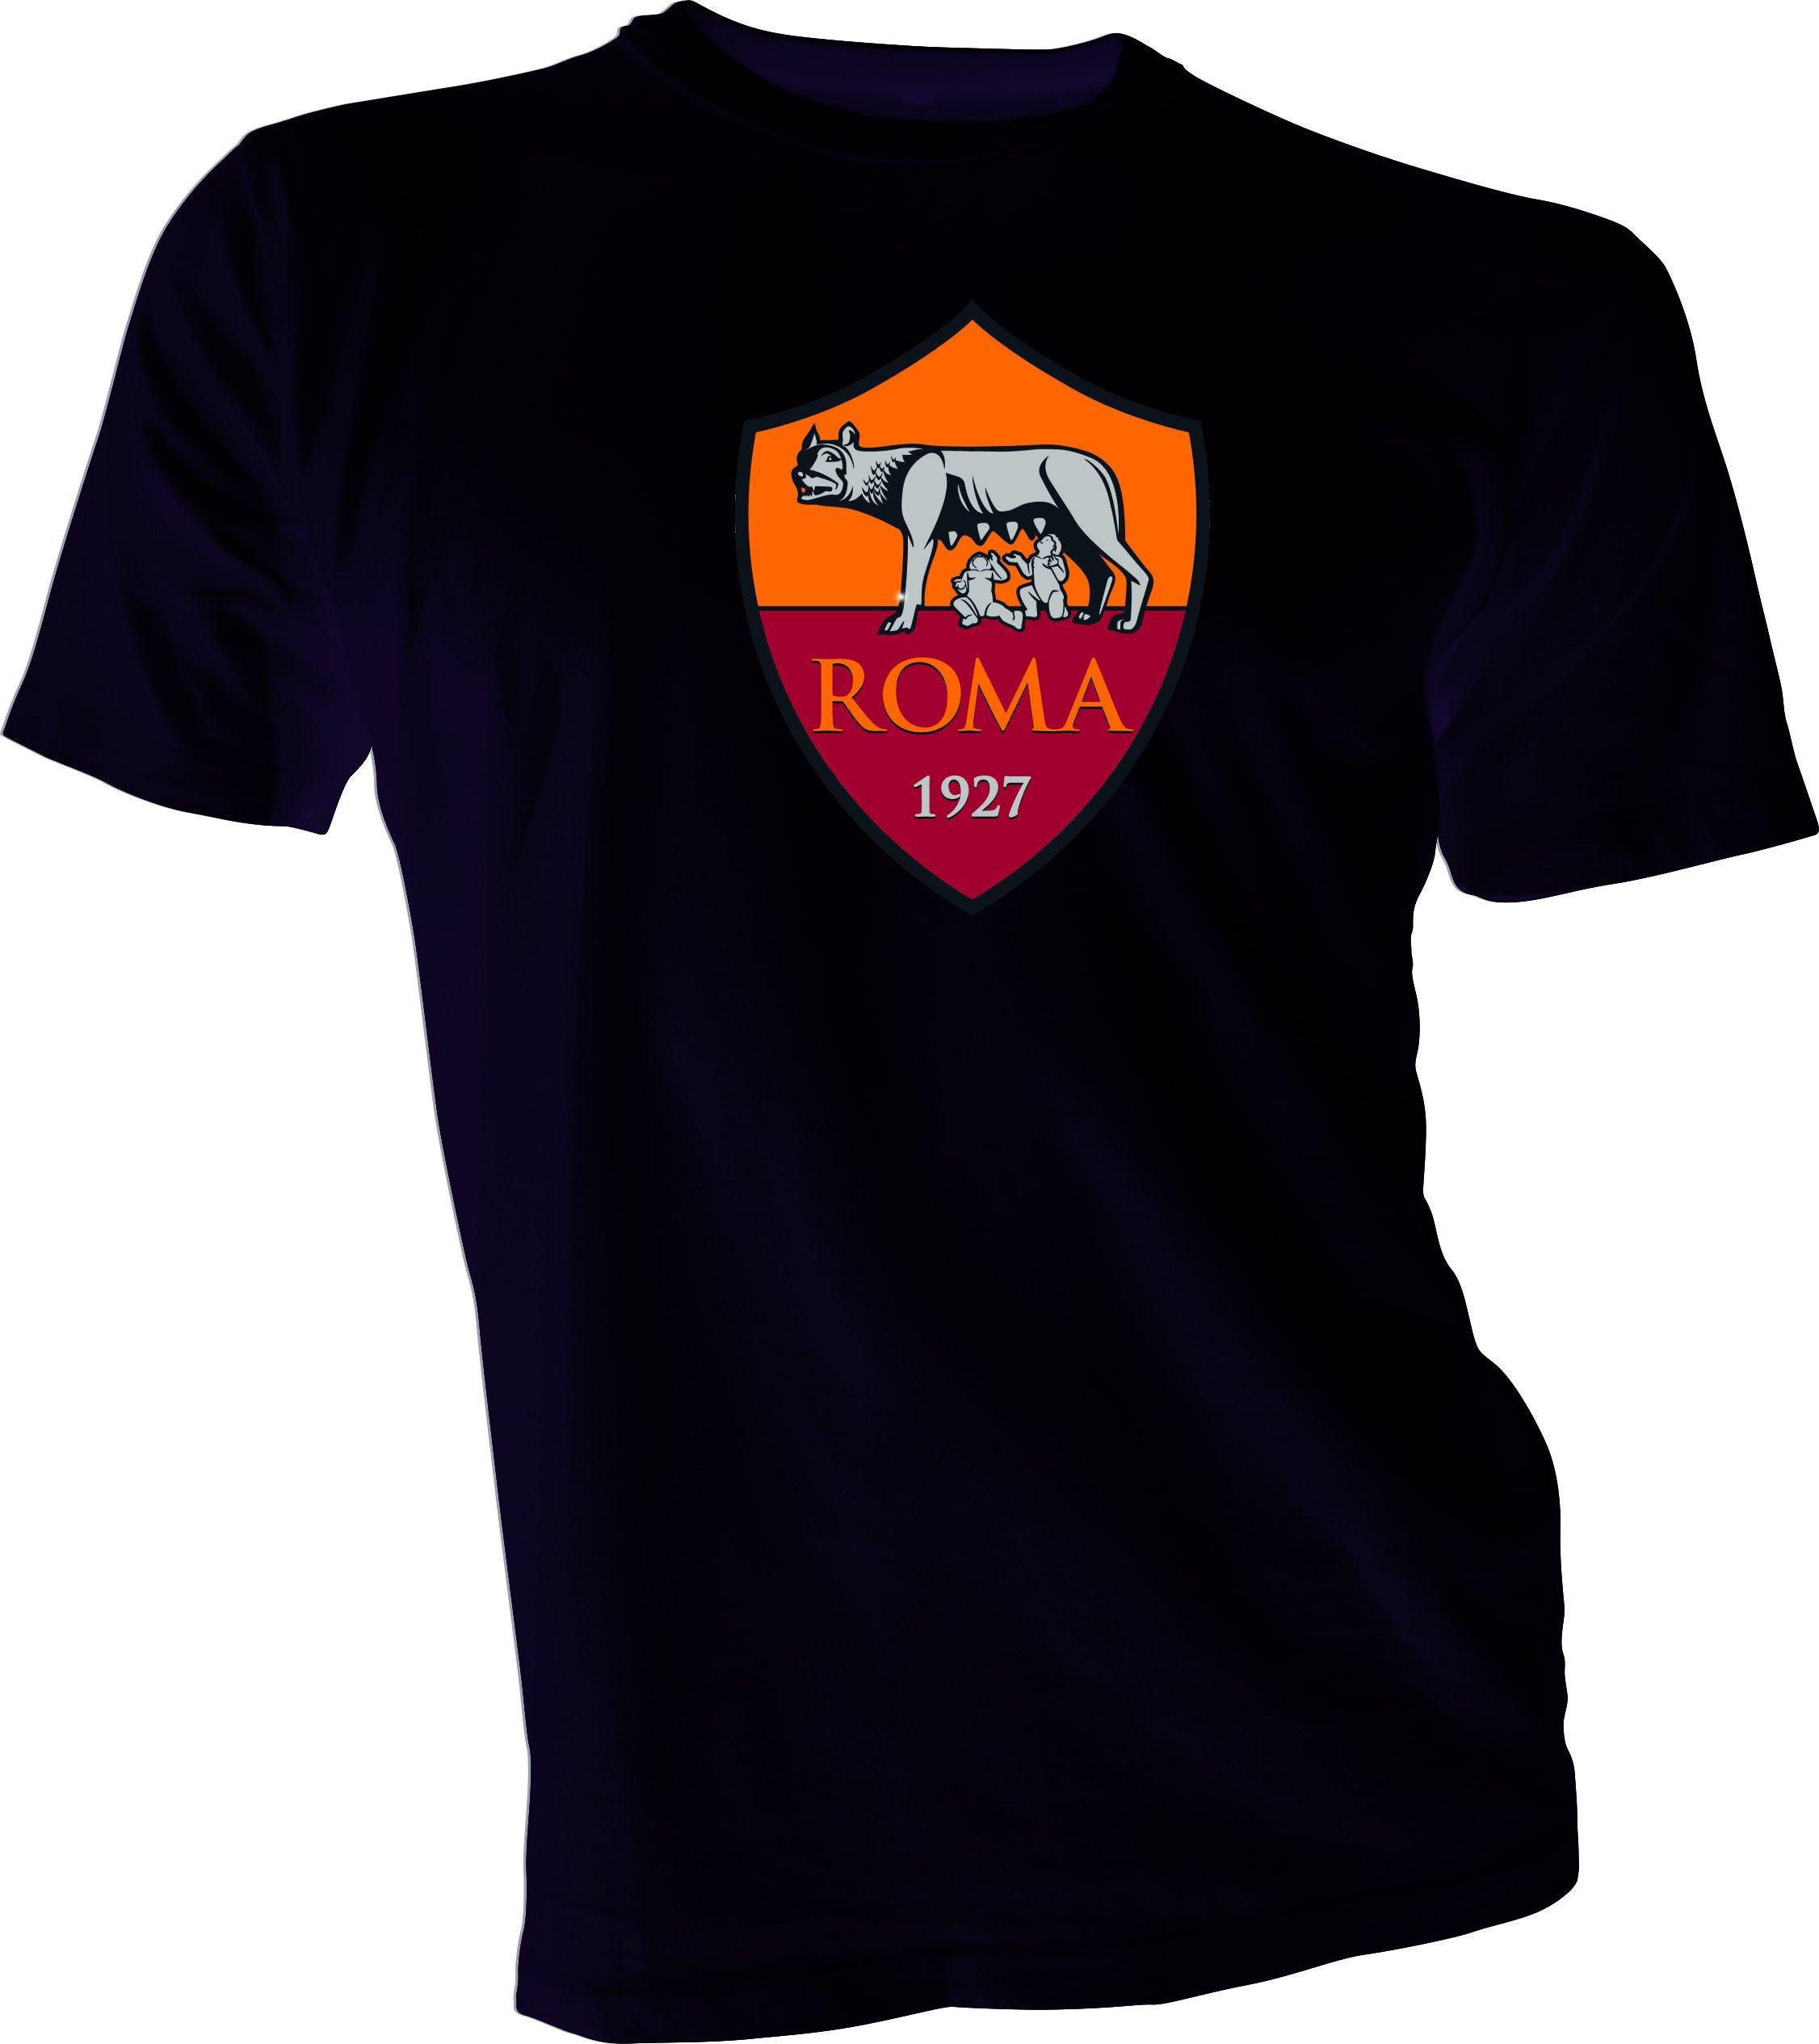 A.S. Roma Giallorossi Italy Serie A Football Soccer T-Shirt Men's Black Medium